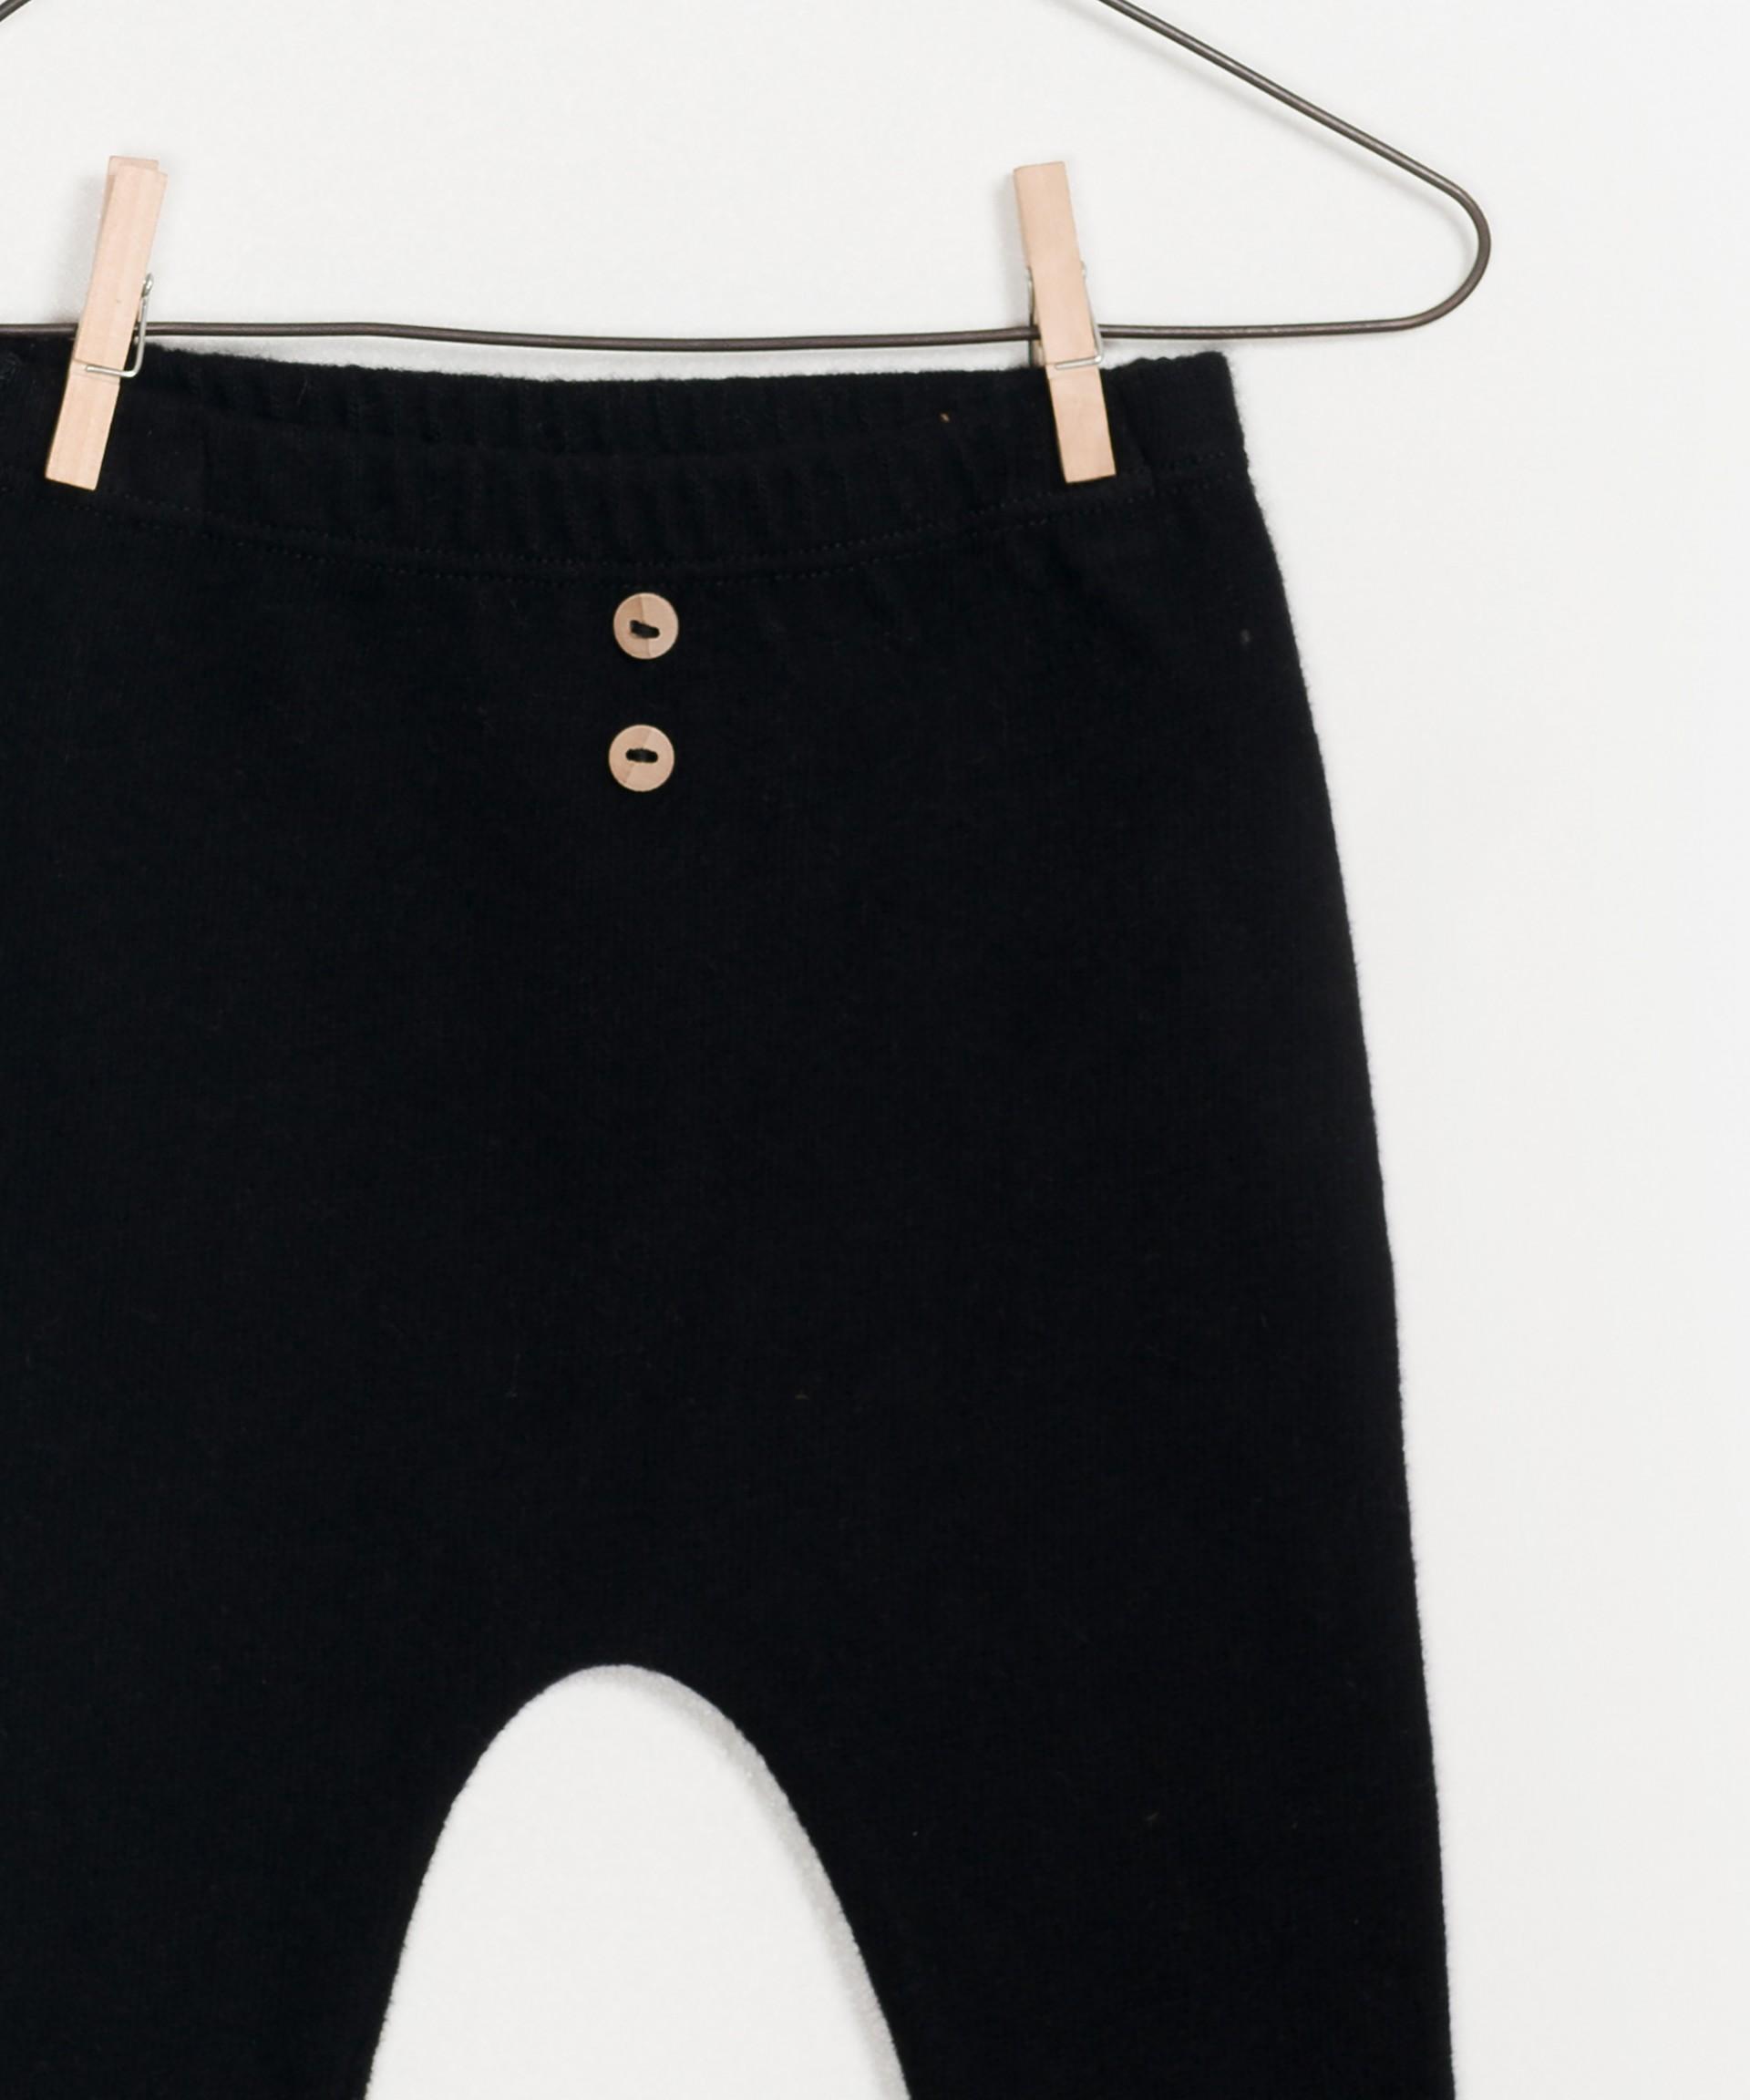 Leggings de algodón 100% orgánico